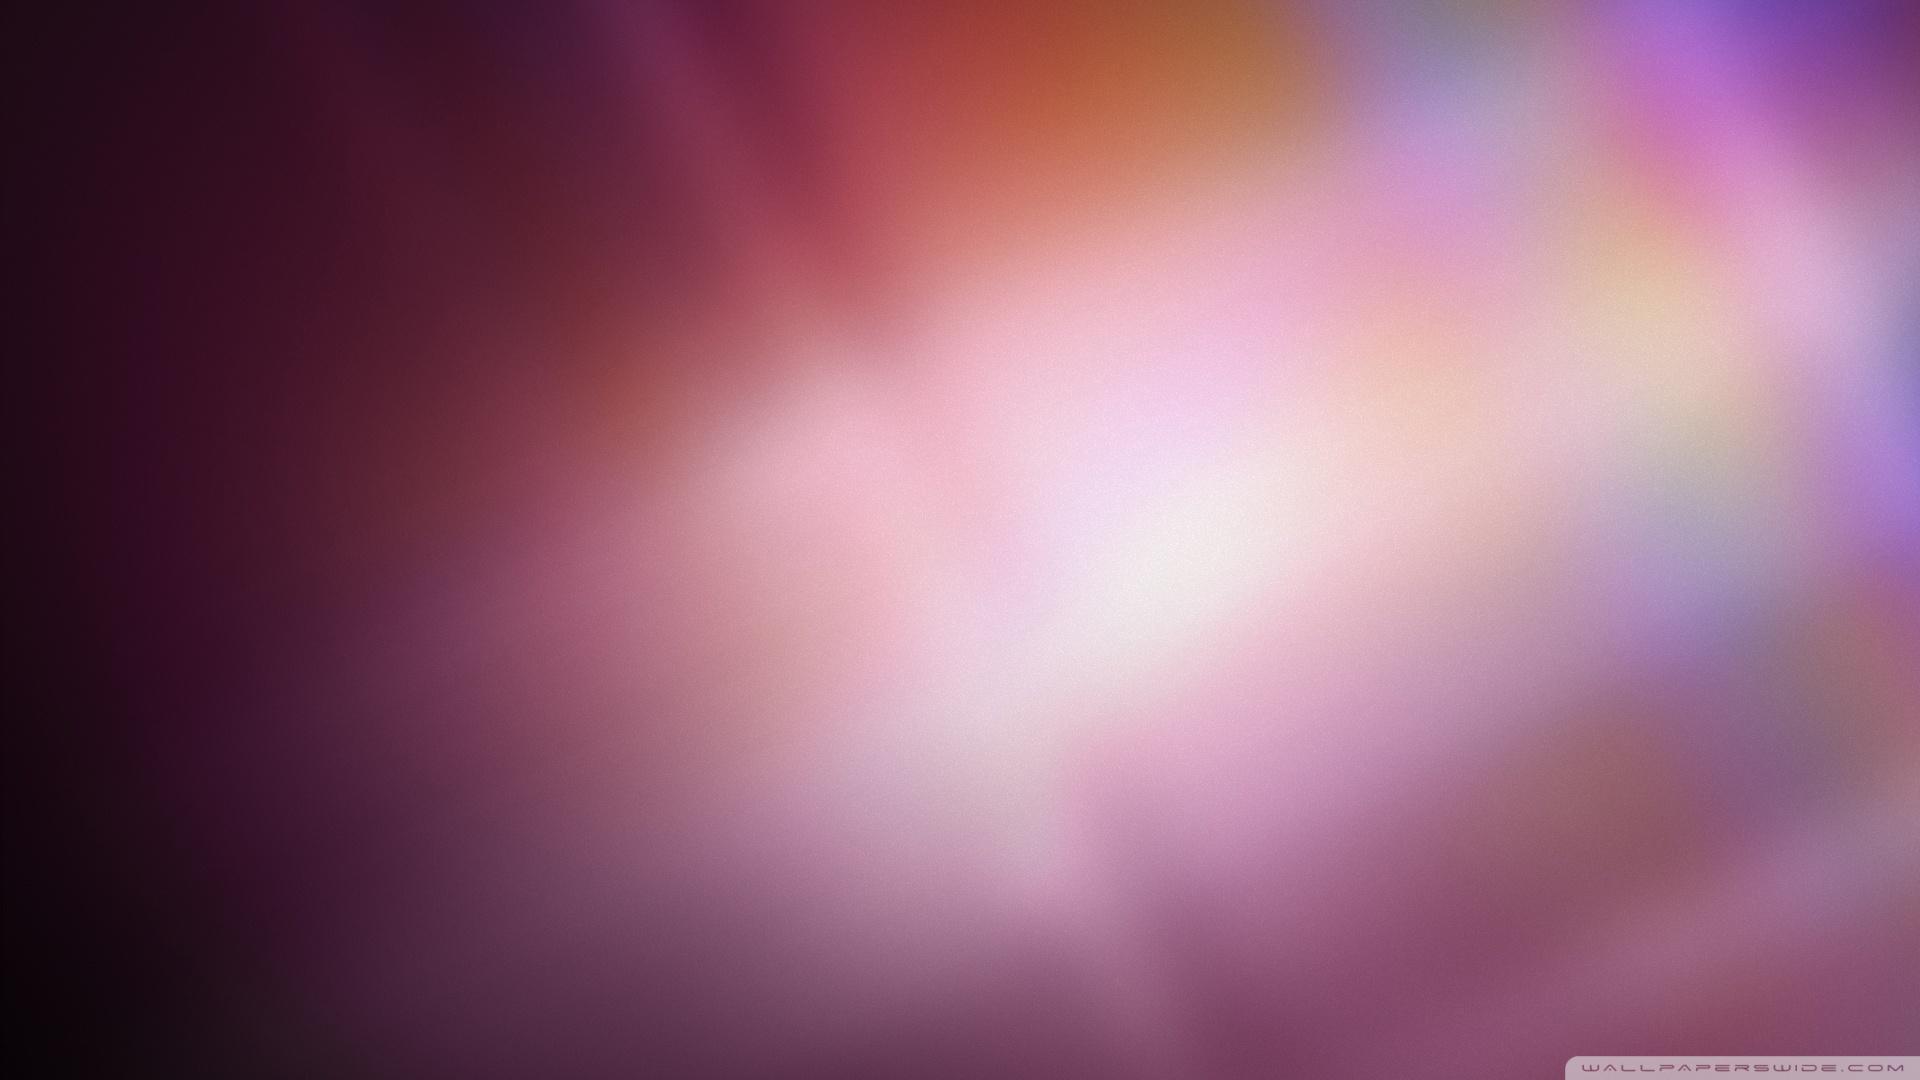 ubuntu wallpaper images 1920x1080 1920x1080